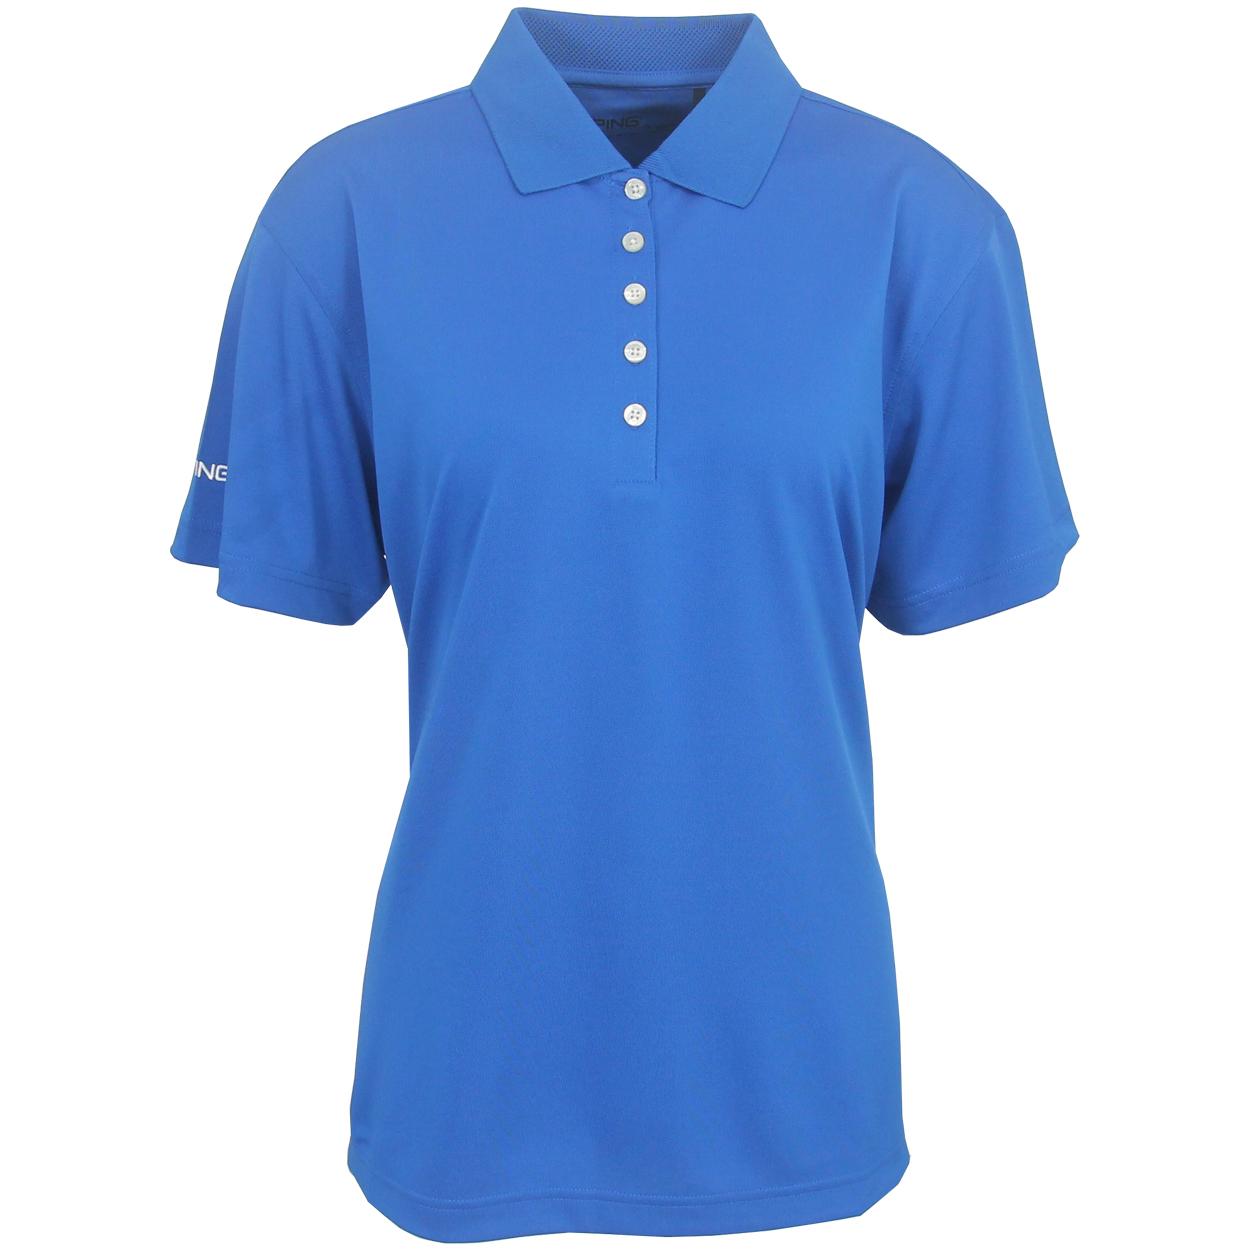 Ping women 39 s albatross performance polo golf shirt brand new for Golf polo shirts for women